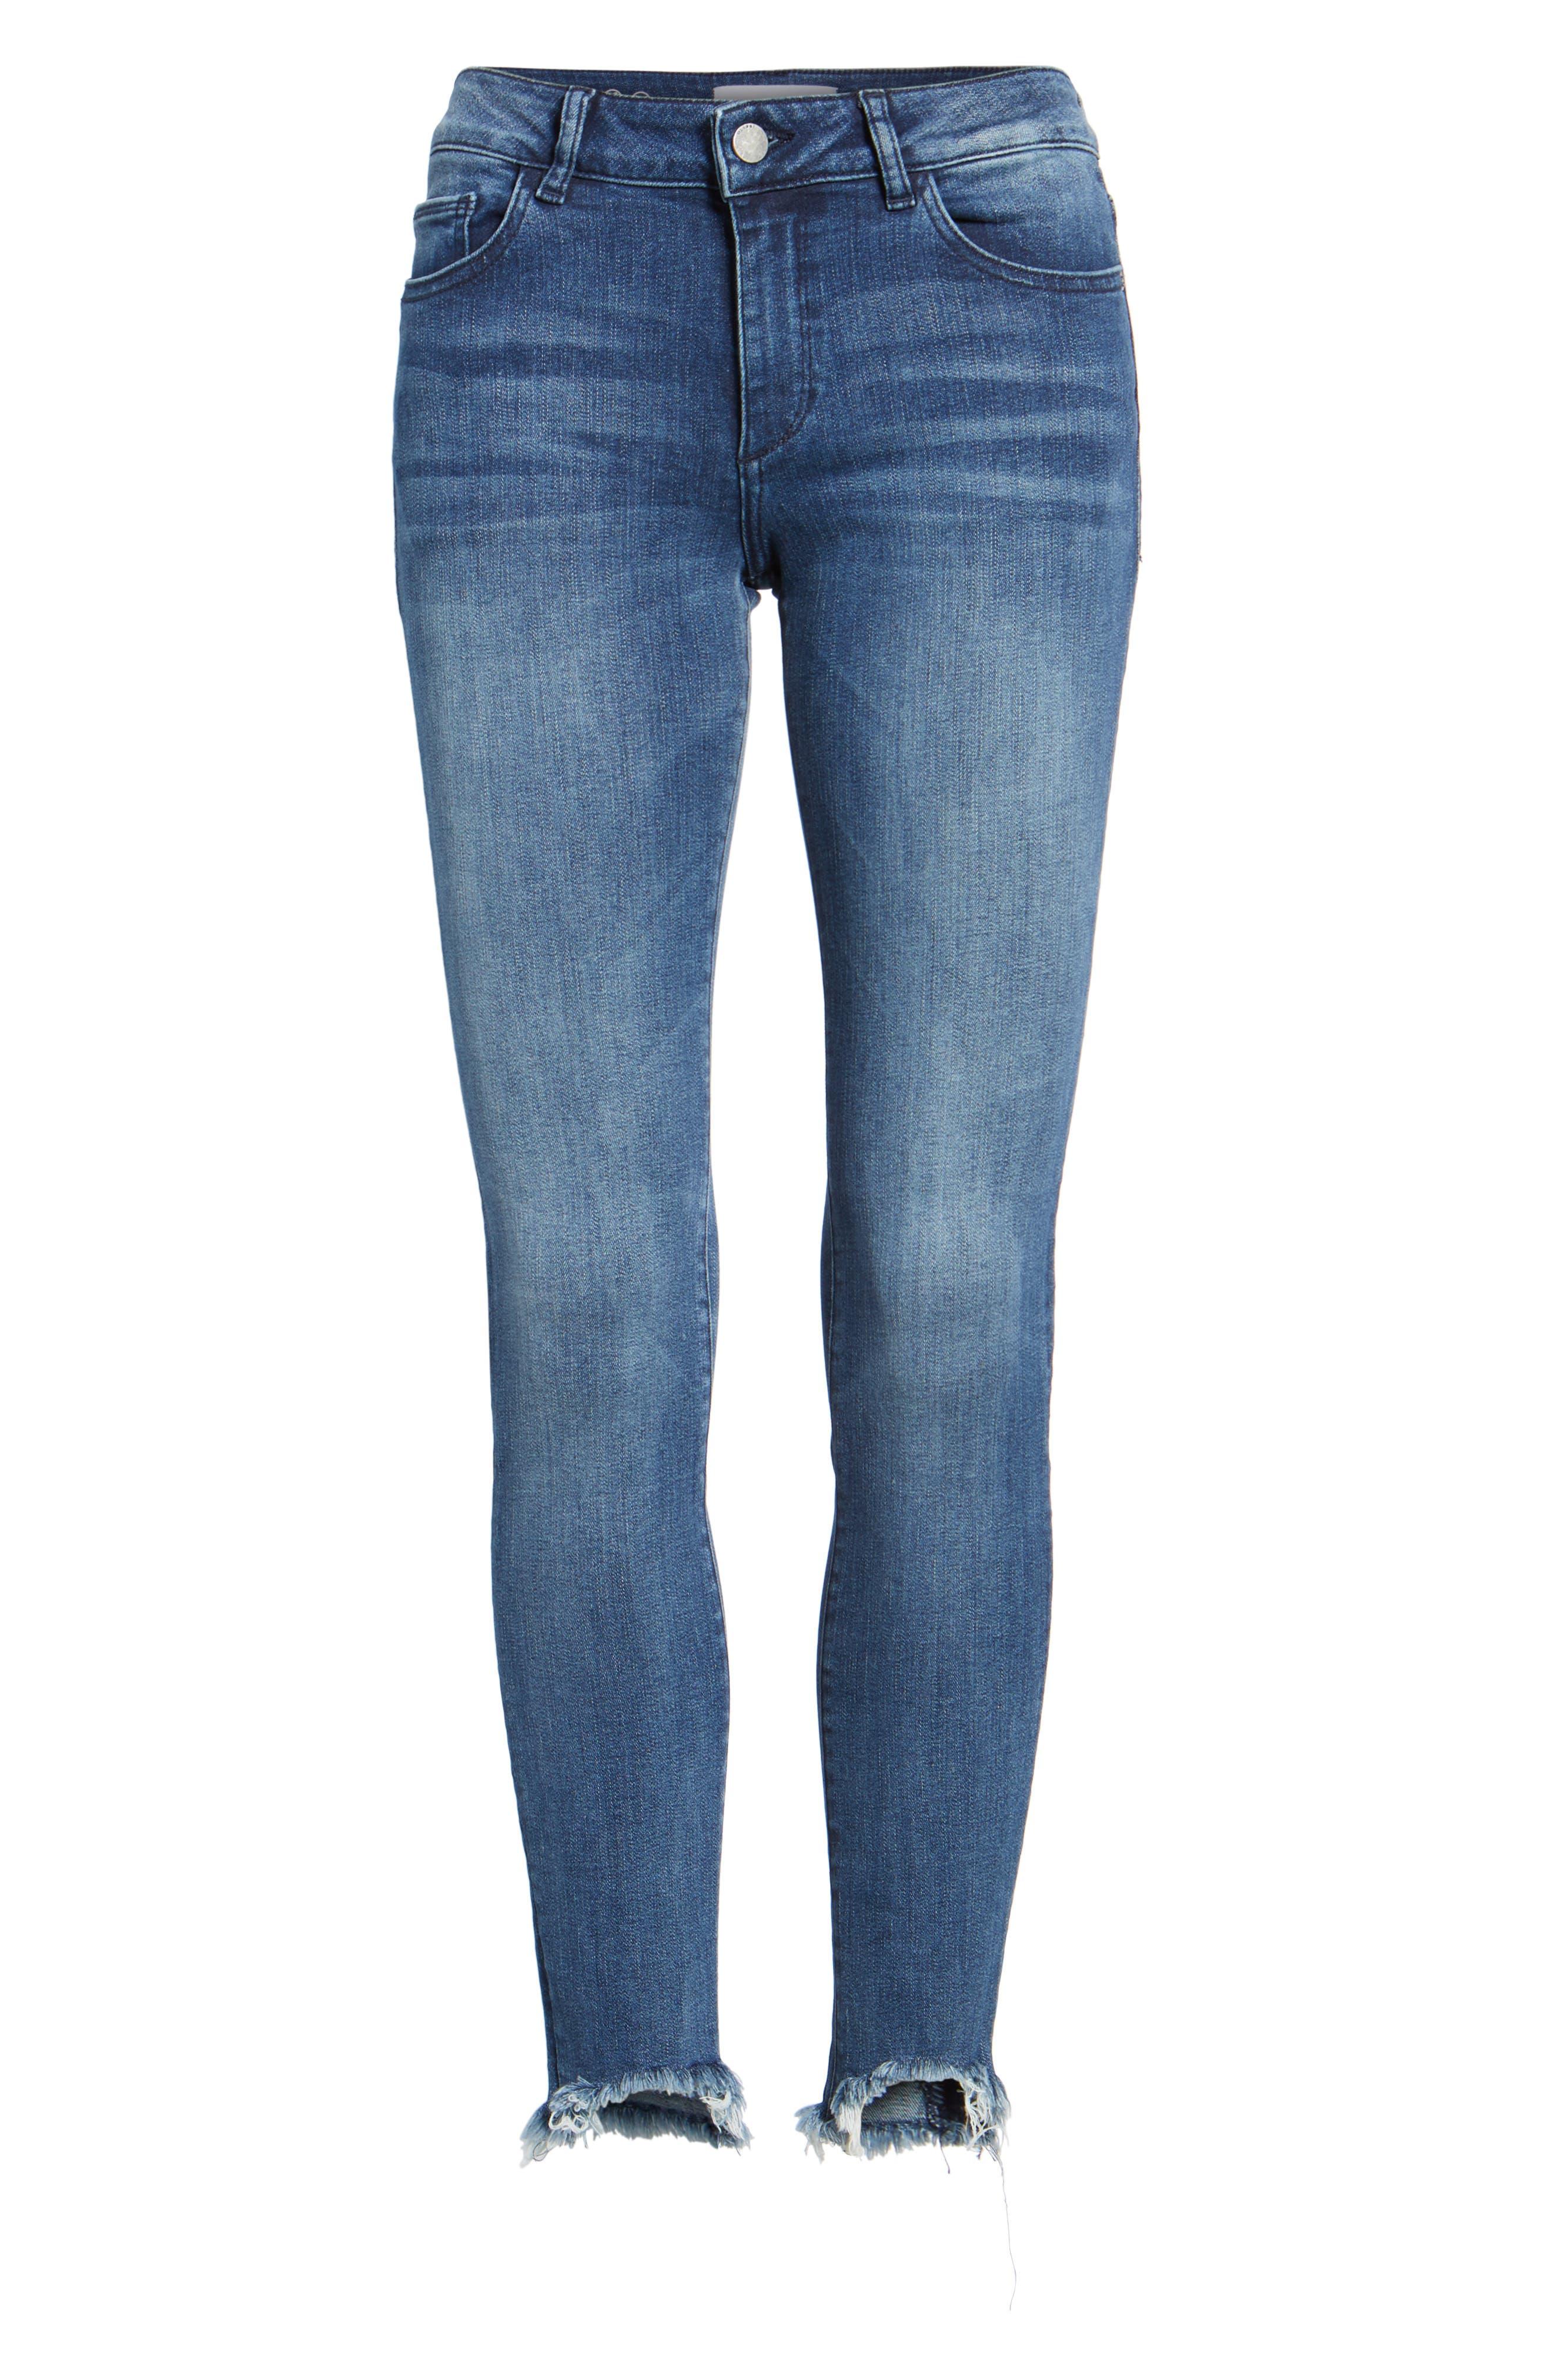 Emma Power Legging Jeans,                             Alternate thumbnail 6, color,                             Fenwick